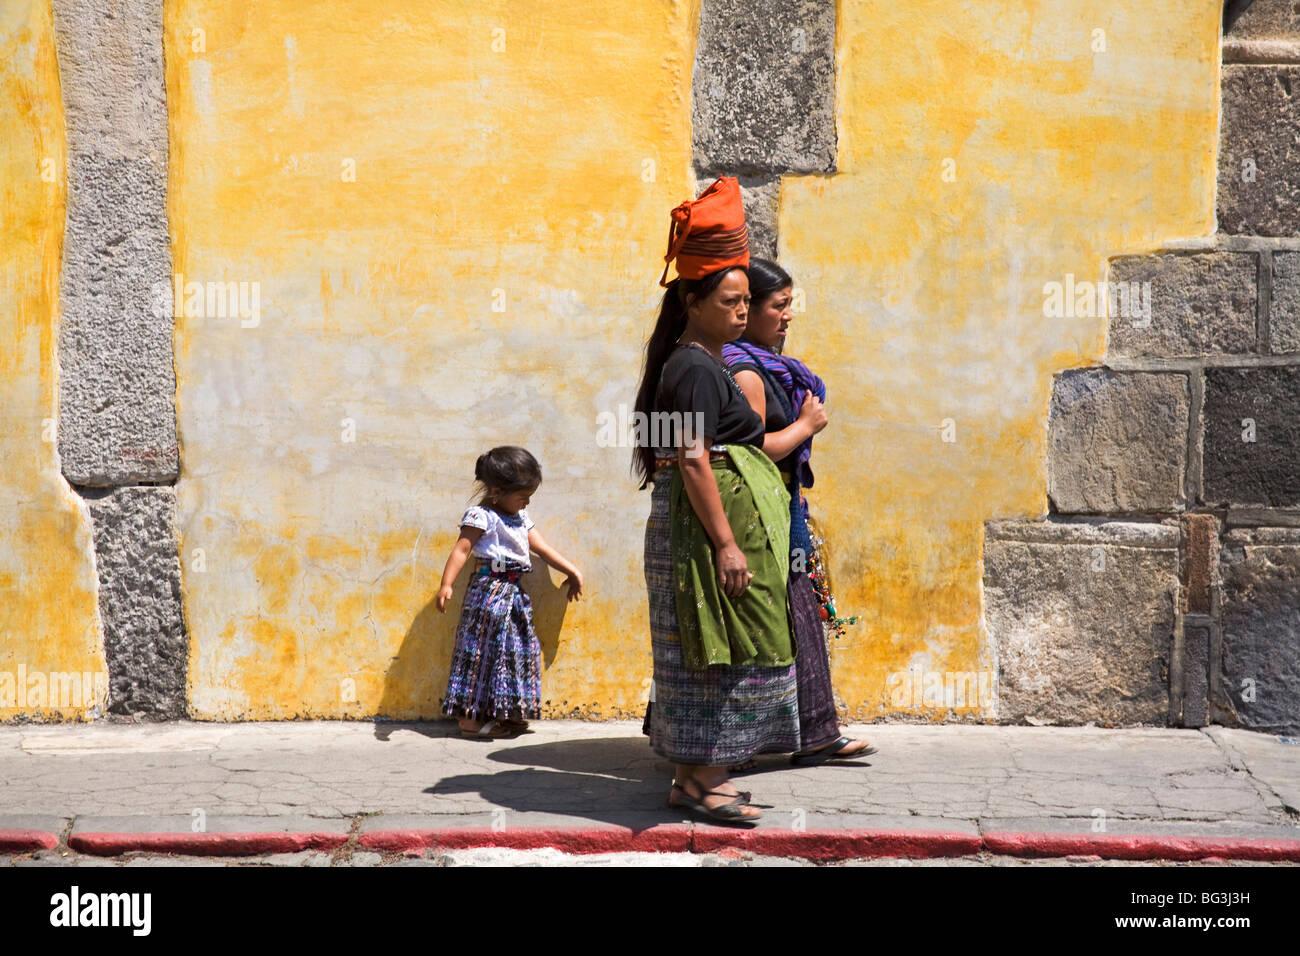 Street vendors, Antigua City, Guatemala, Central America - Stock Image